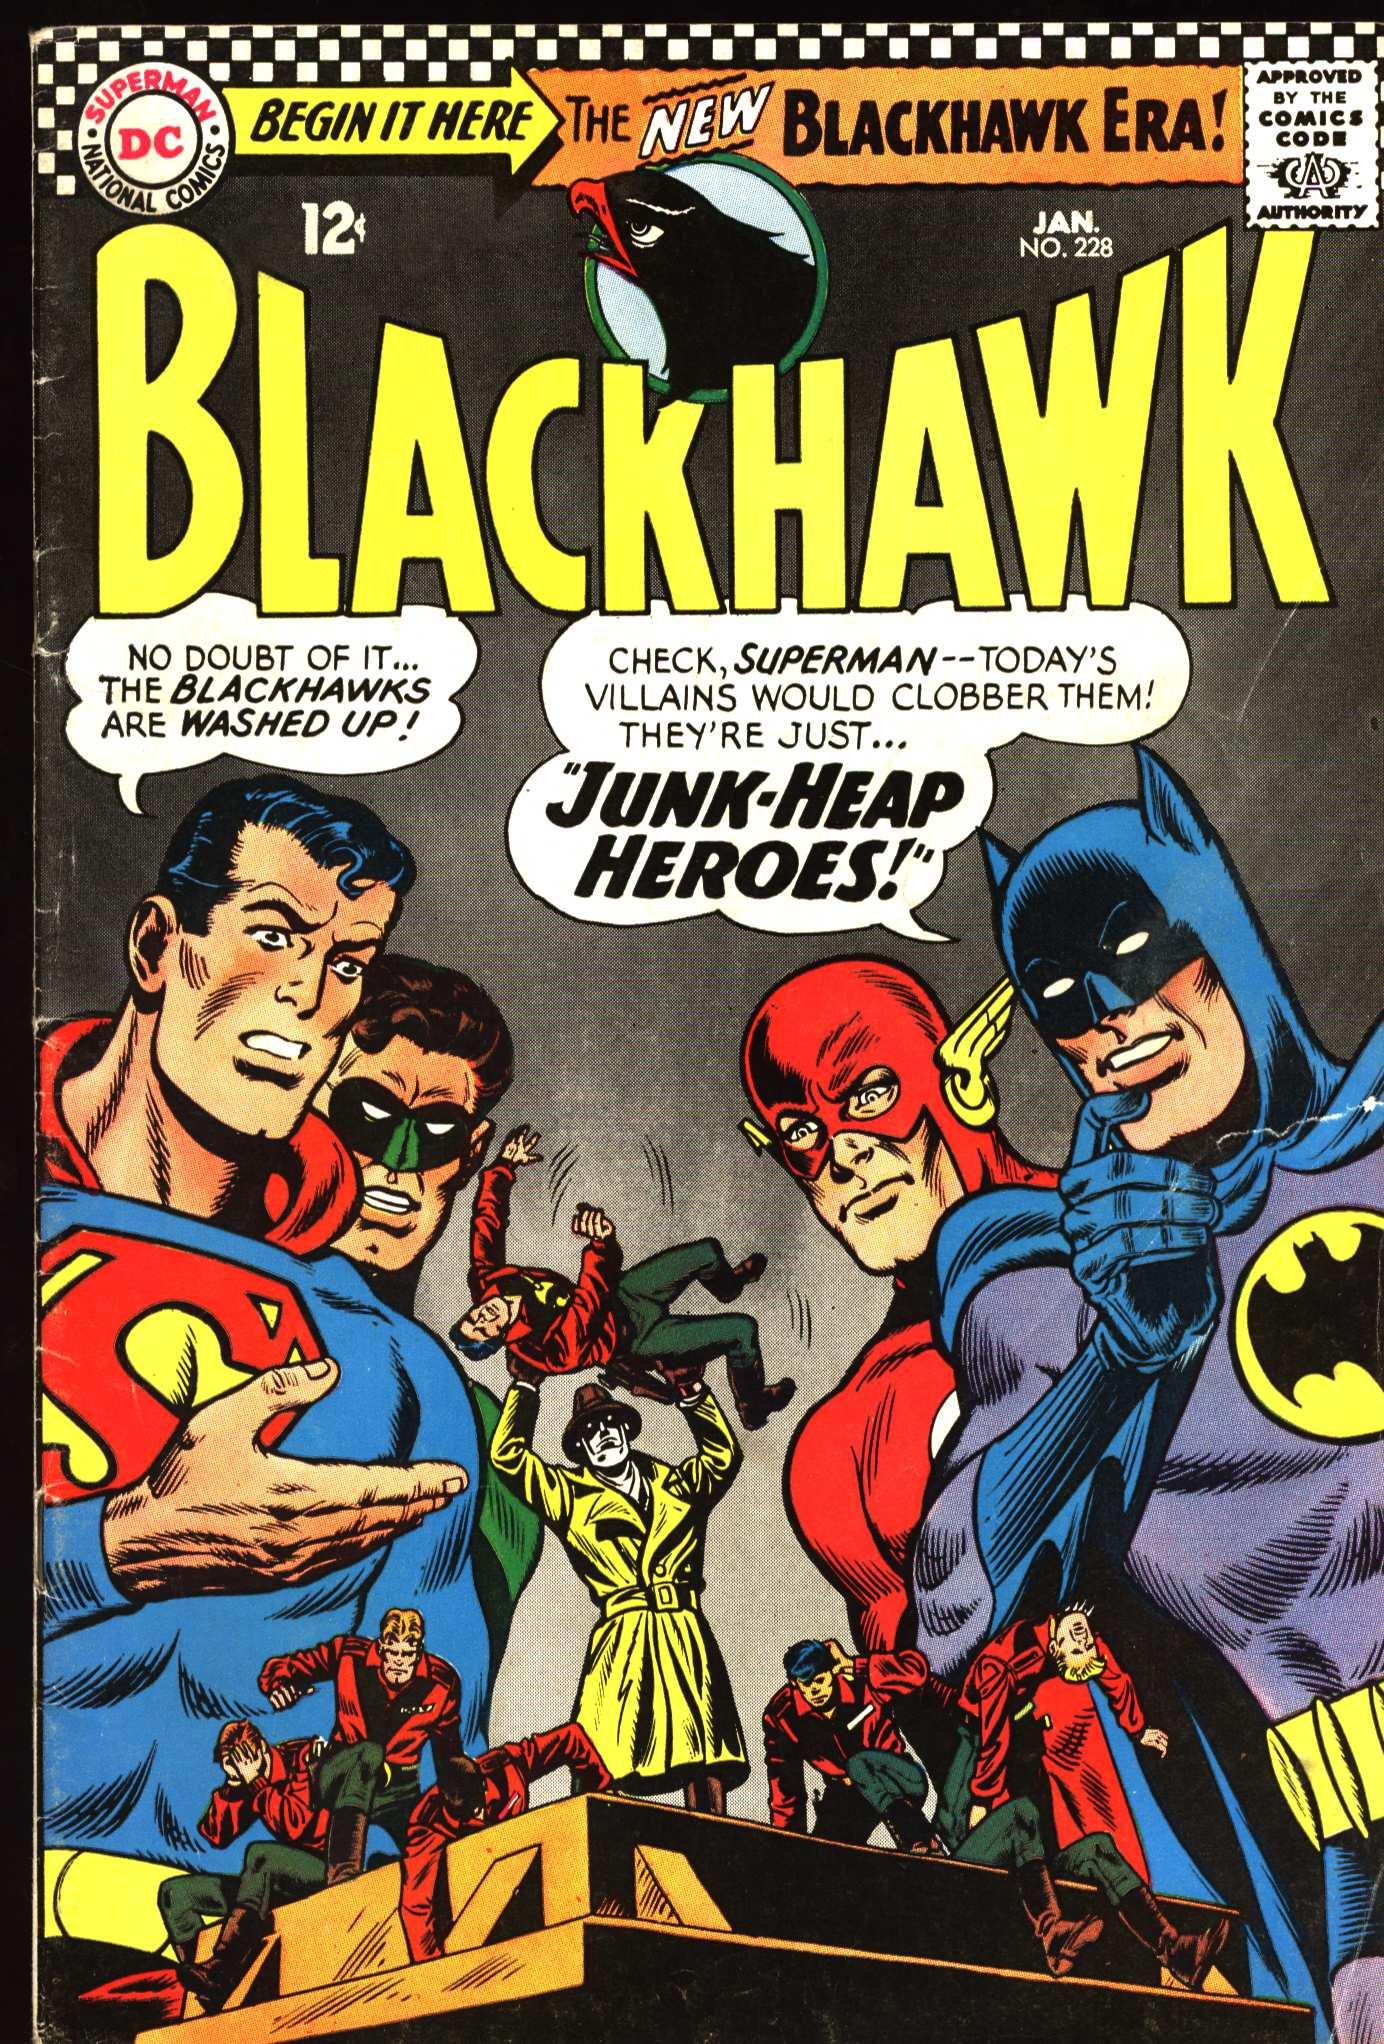 Blackhawk (1957) 228 Page 1